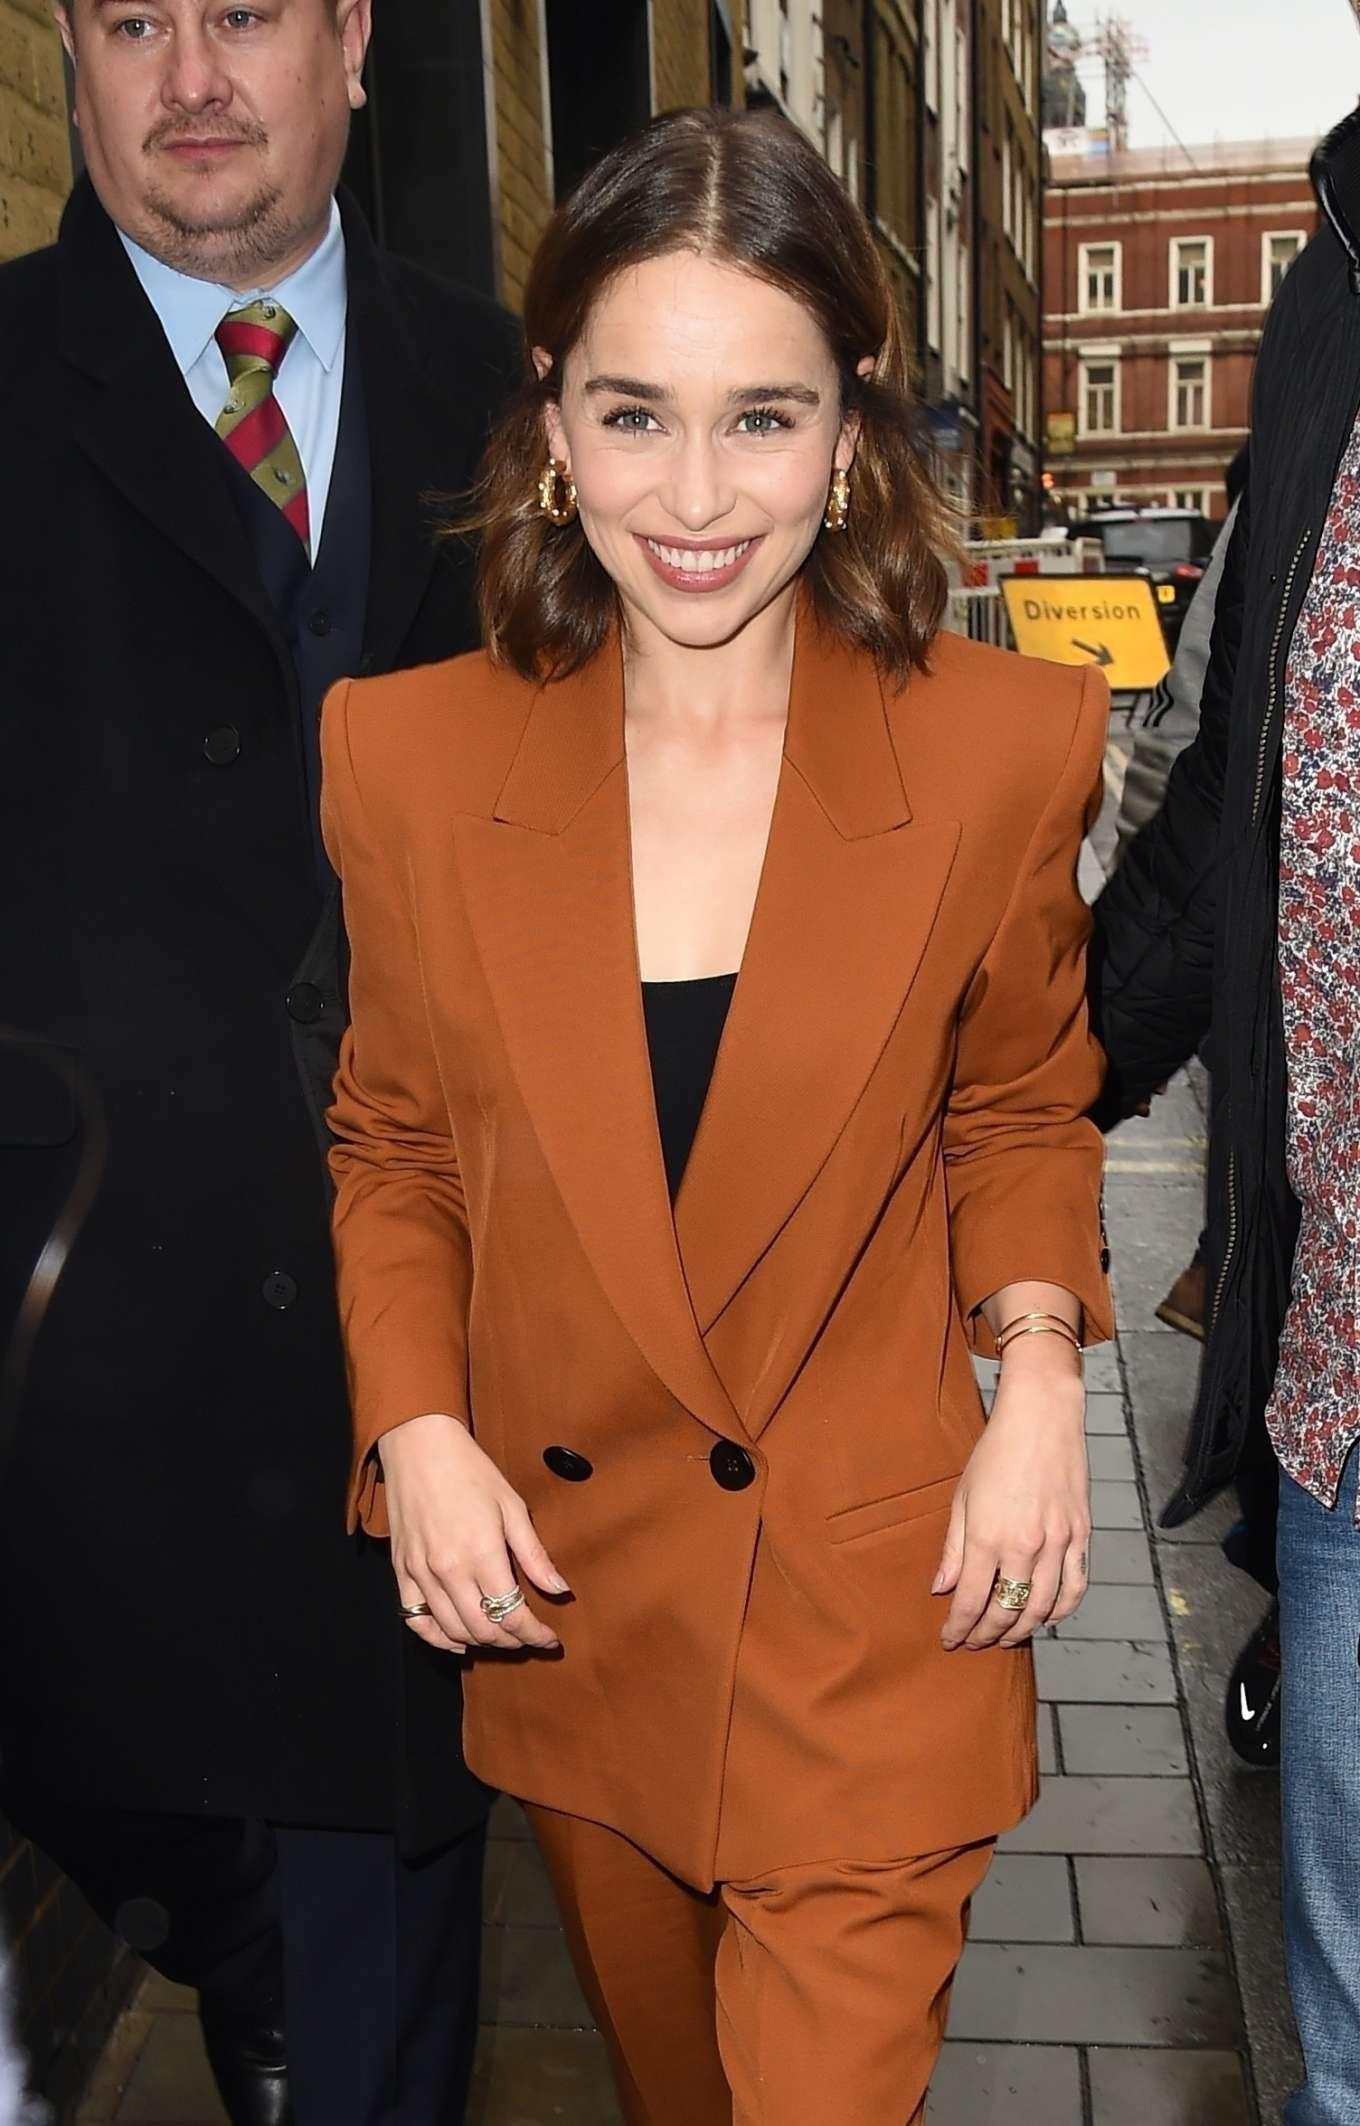 Emilia Clarke in Brown Pantsuit - Arriving back at her hotel in London